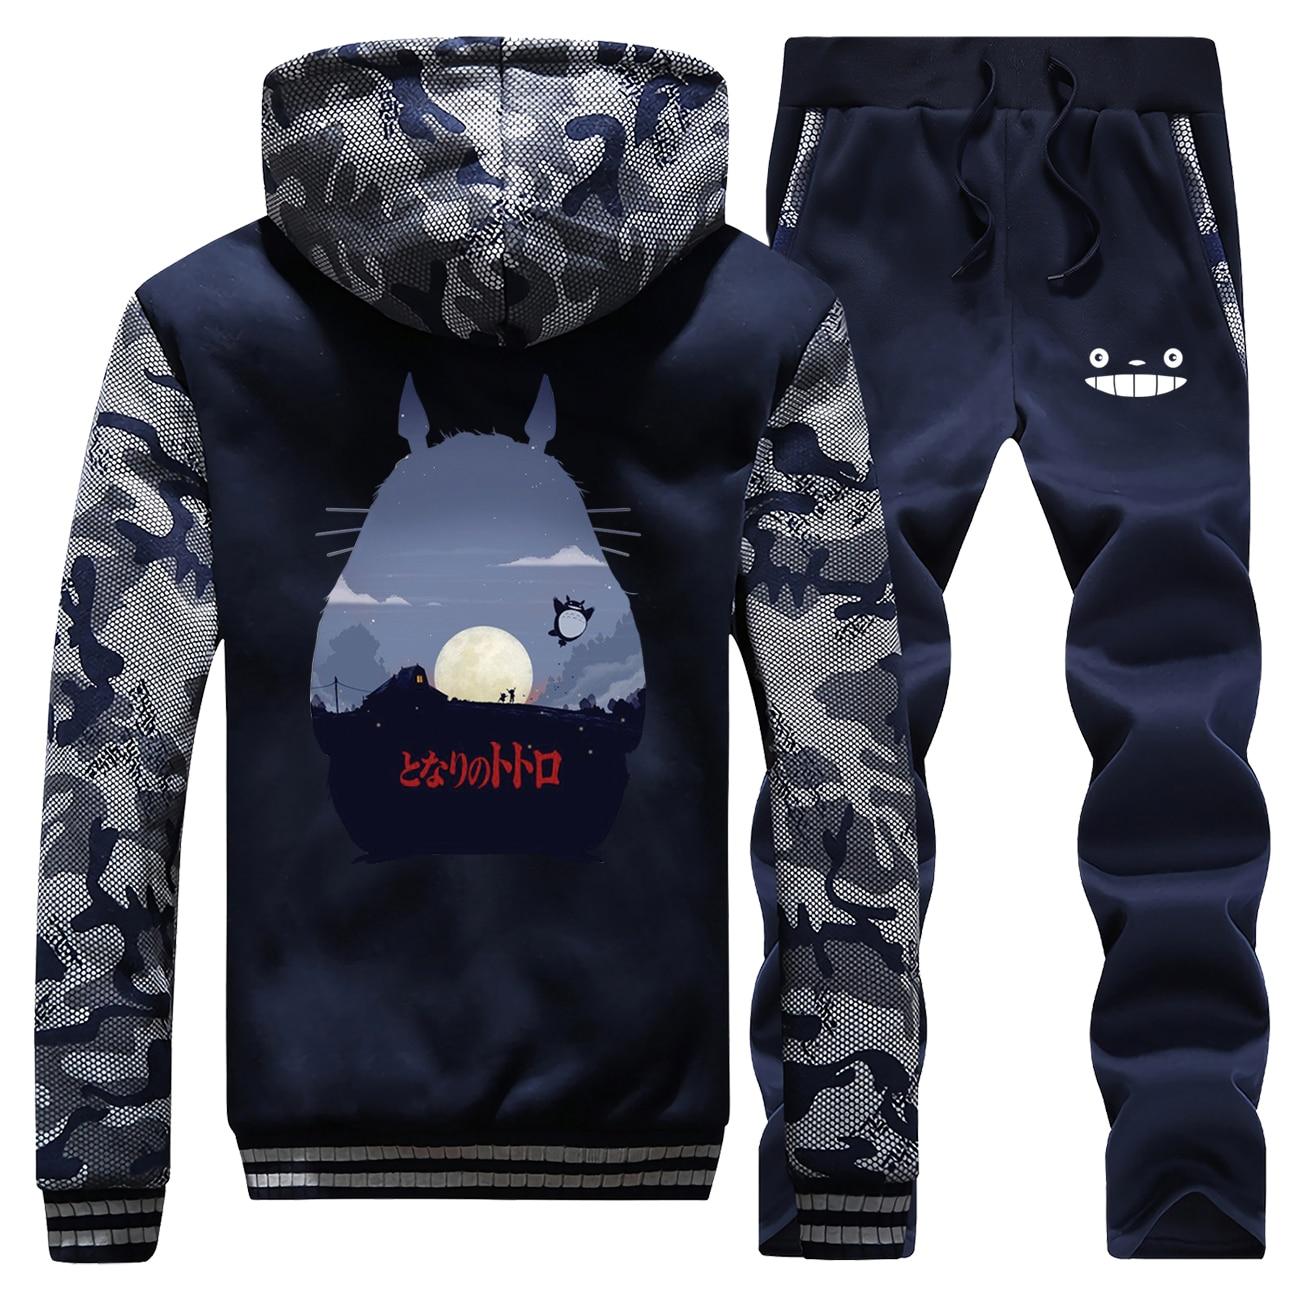 Funny Japan Anime Tonari No Totoro Streetwear Camo Hoodies Pants Sets Mens Casual Plus Size Fleece Sportswear Zipper Sweatshirt